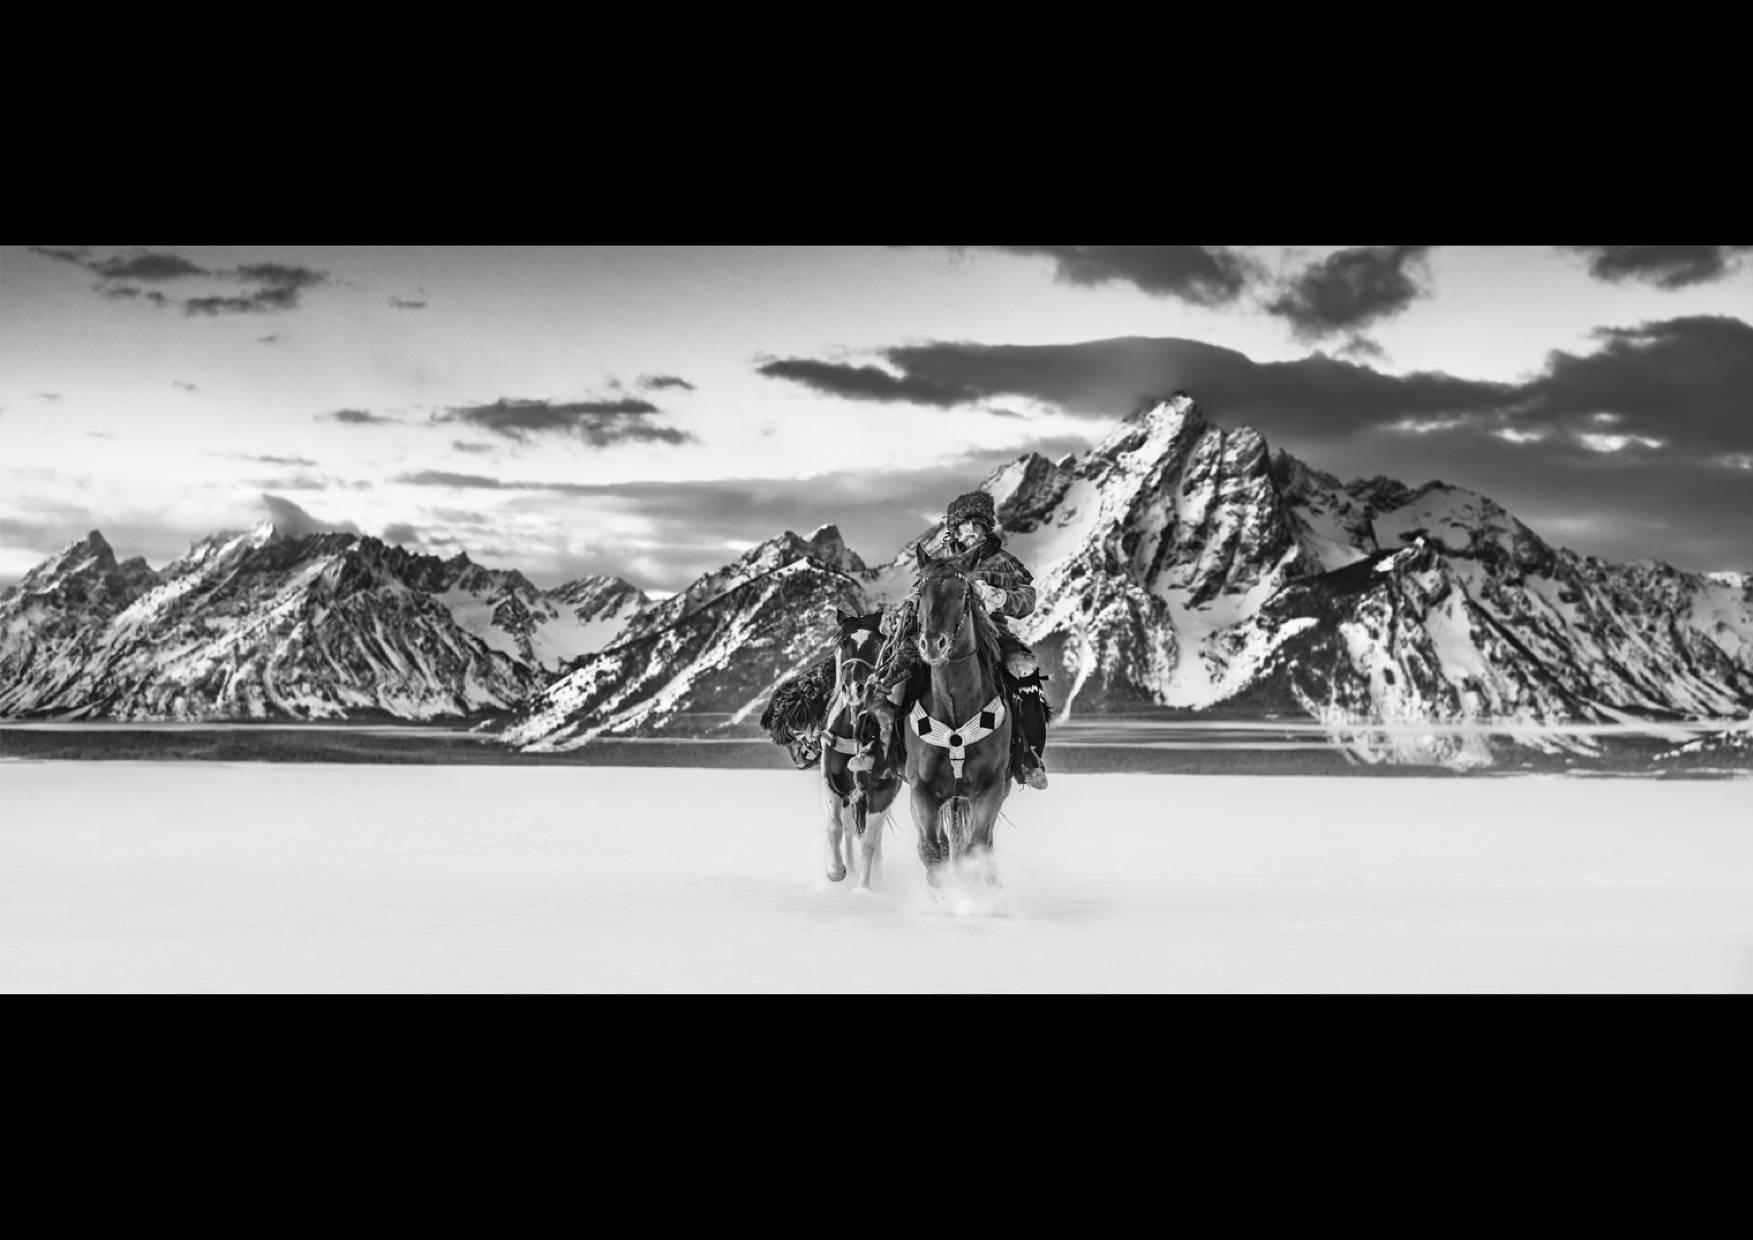 David Yarrow Wyoming Grand Teton National Park